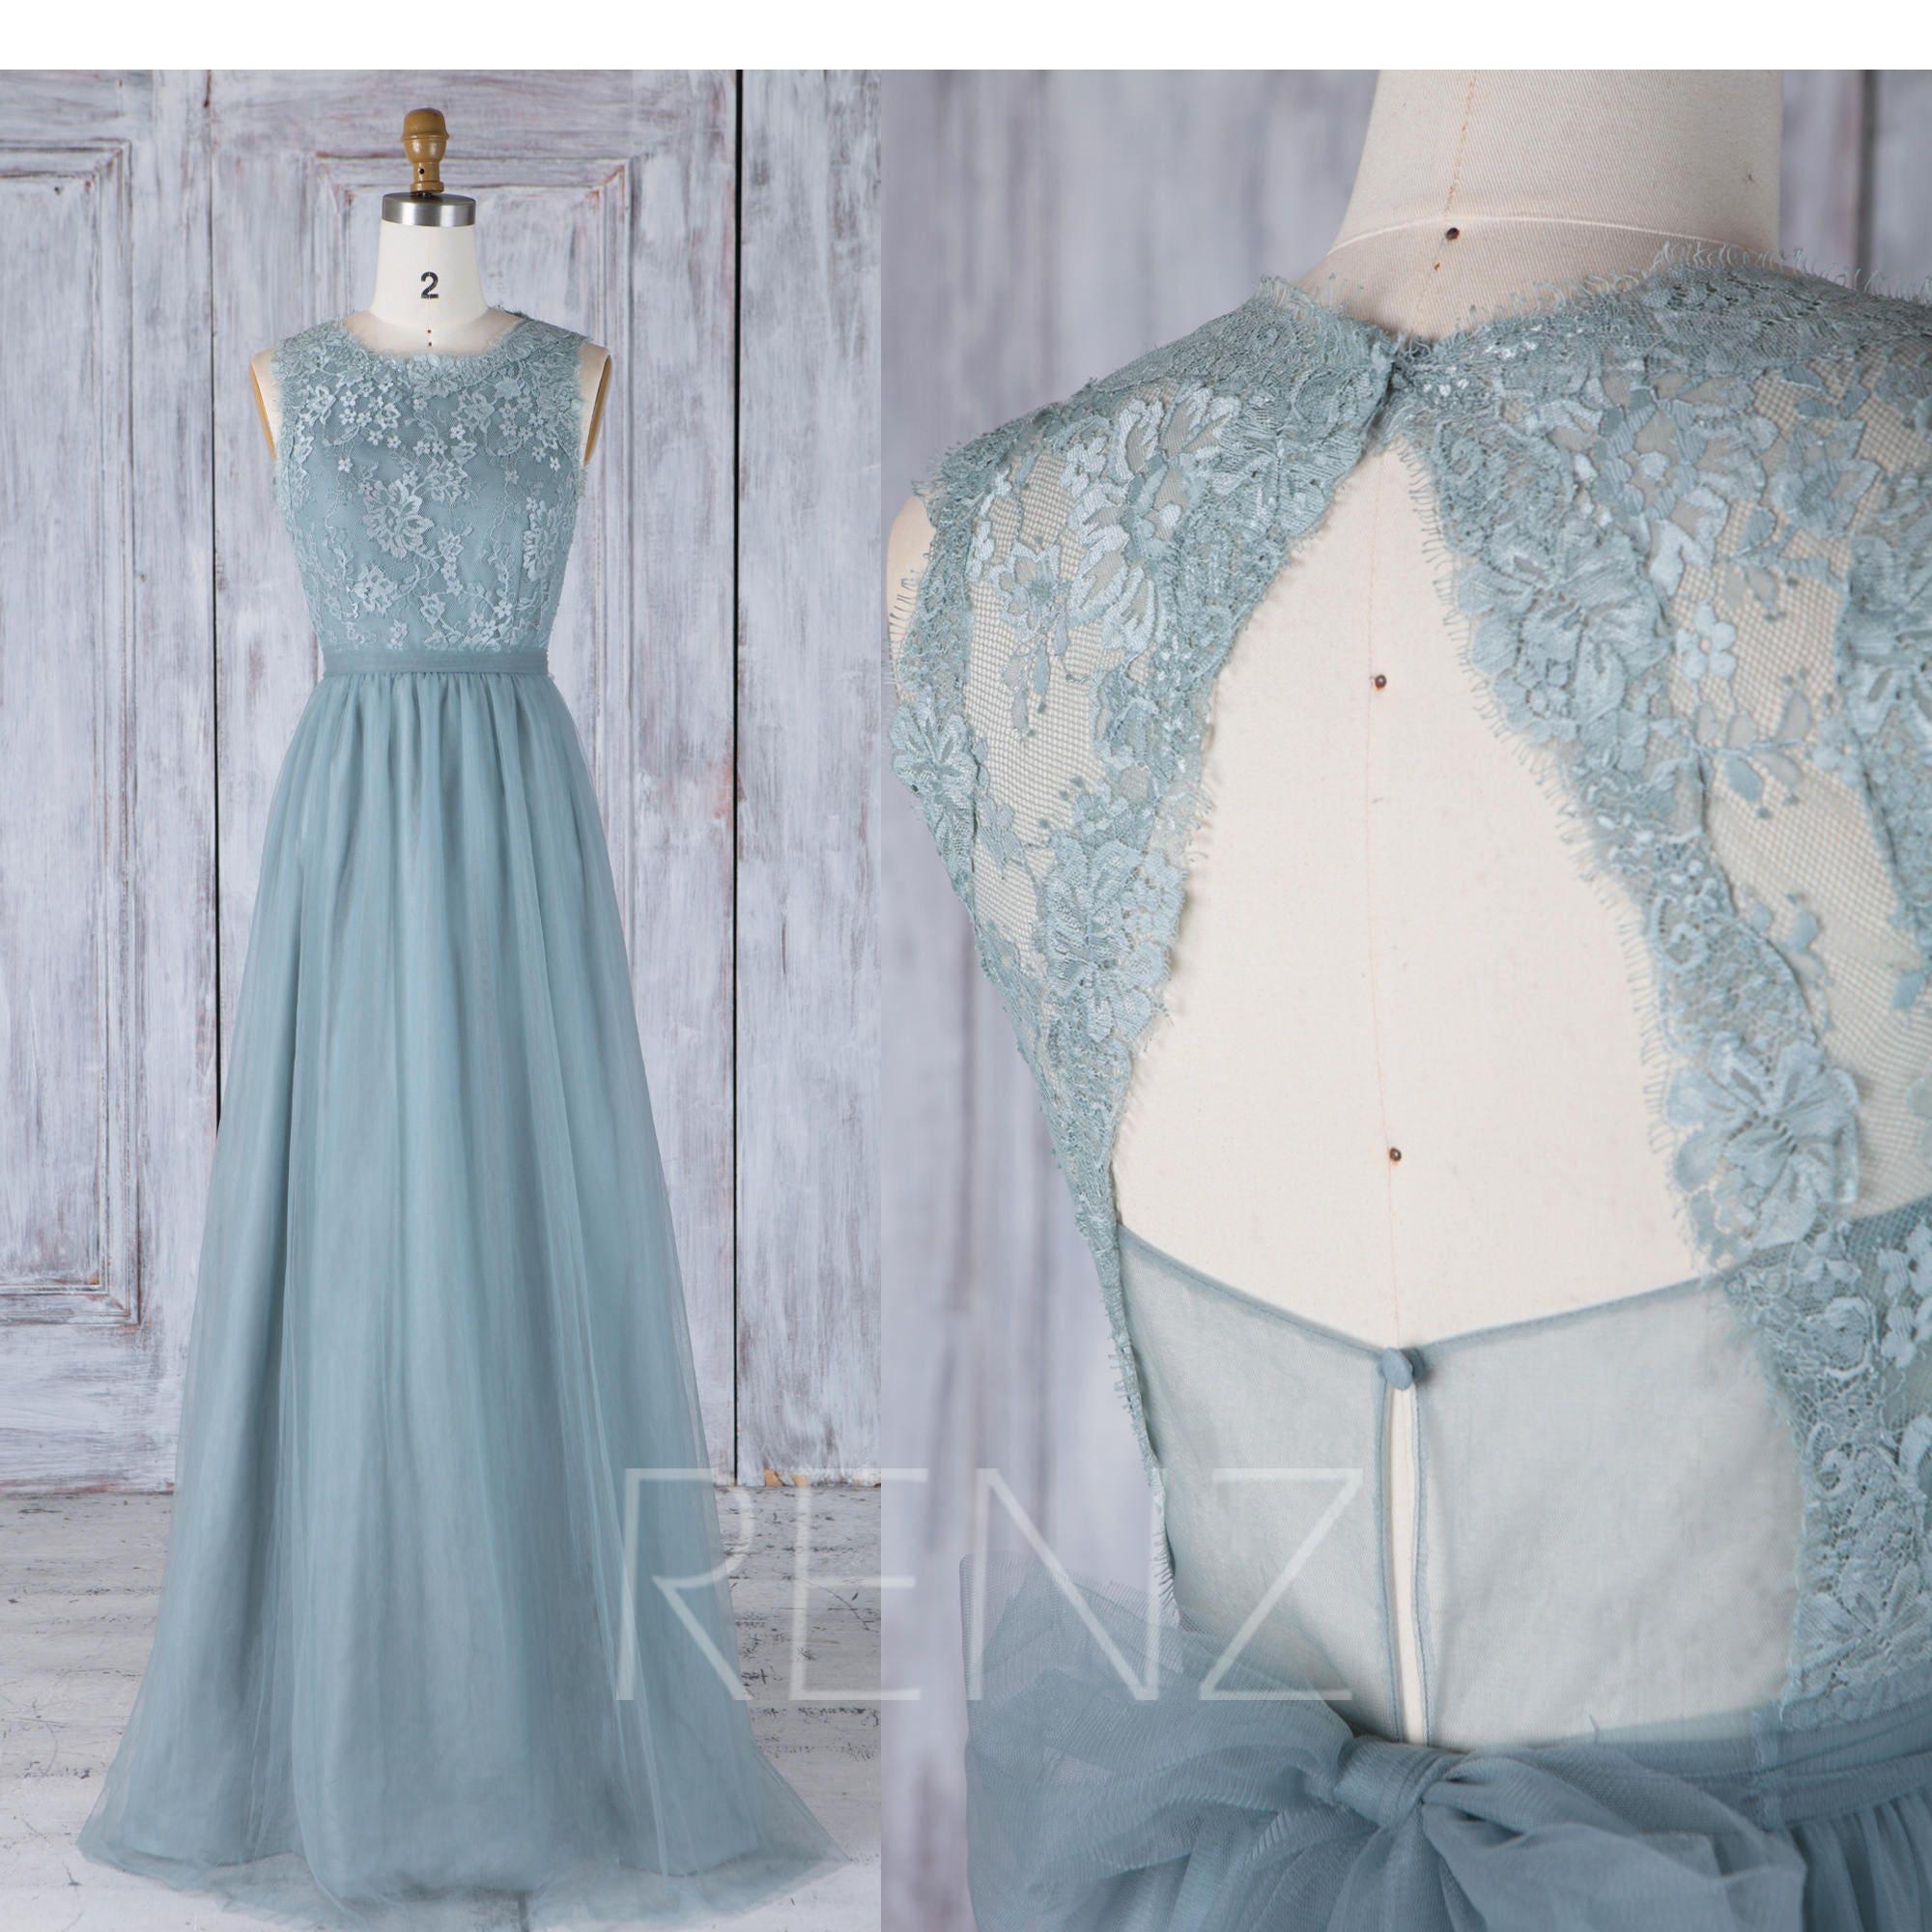 Bridesmaid Dress Dusty Blue Tulle DressWedding DressLace